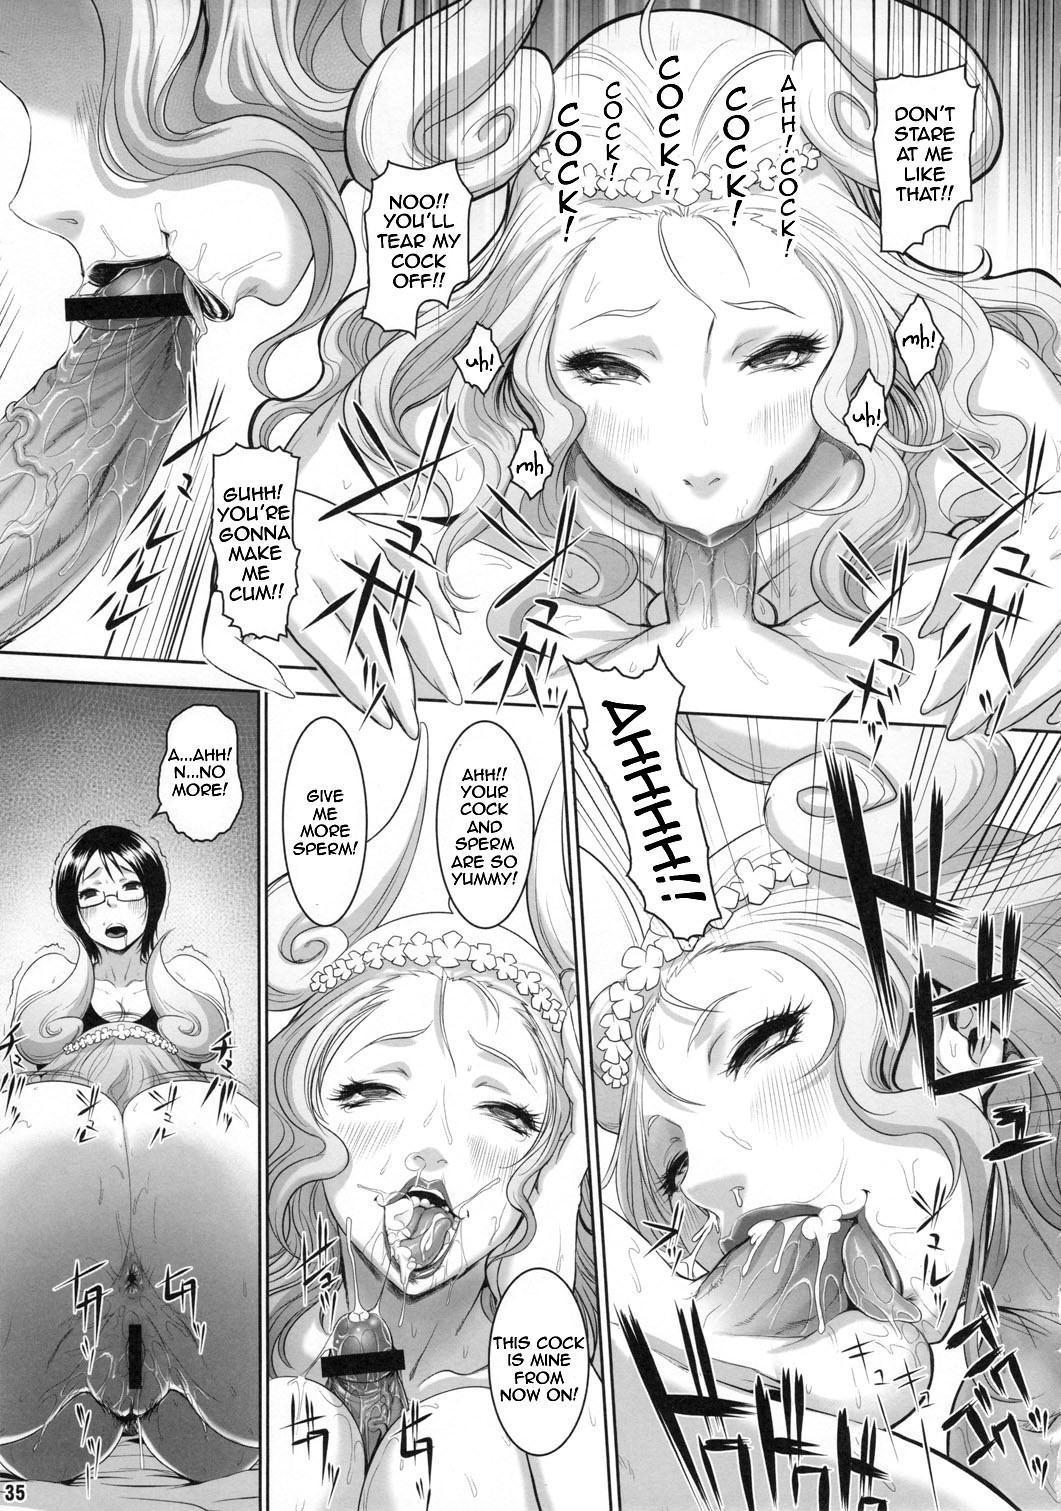 Midare Saki Joshuu Kaizoku Soushuuhen   Bloom, Pirate Hooker! Bloom! Annual 94